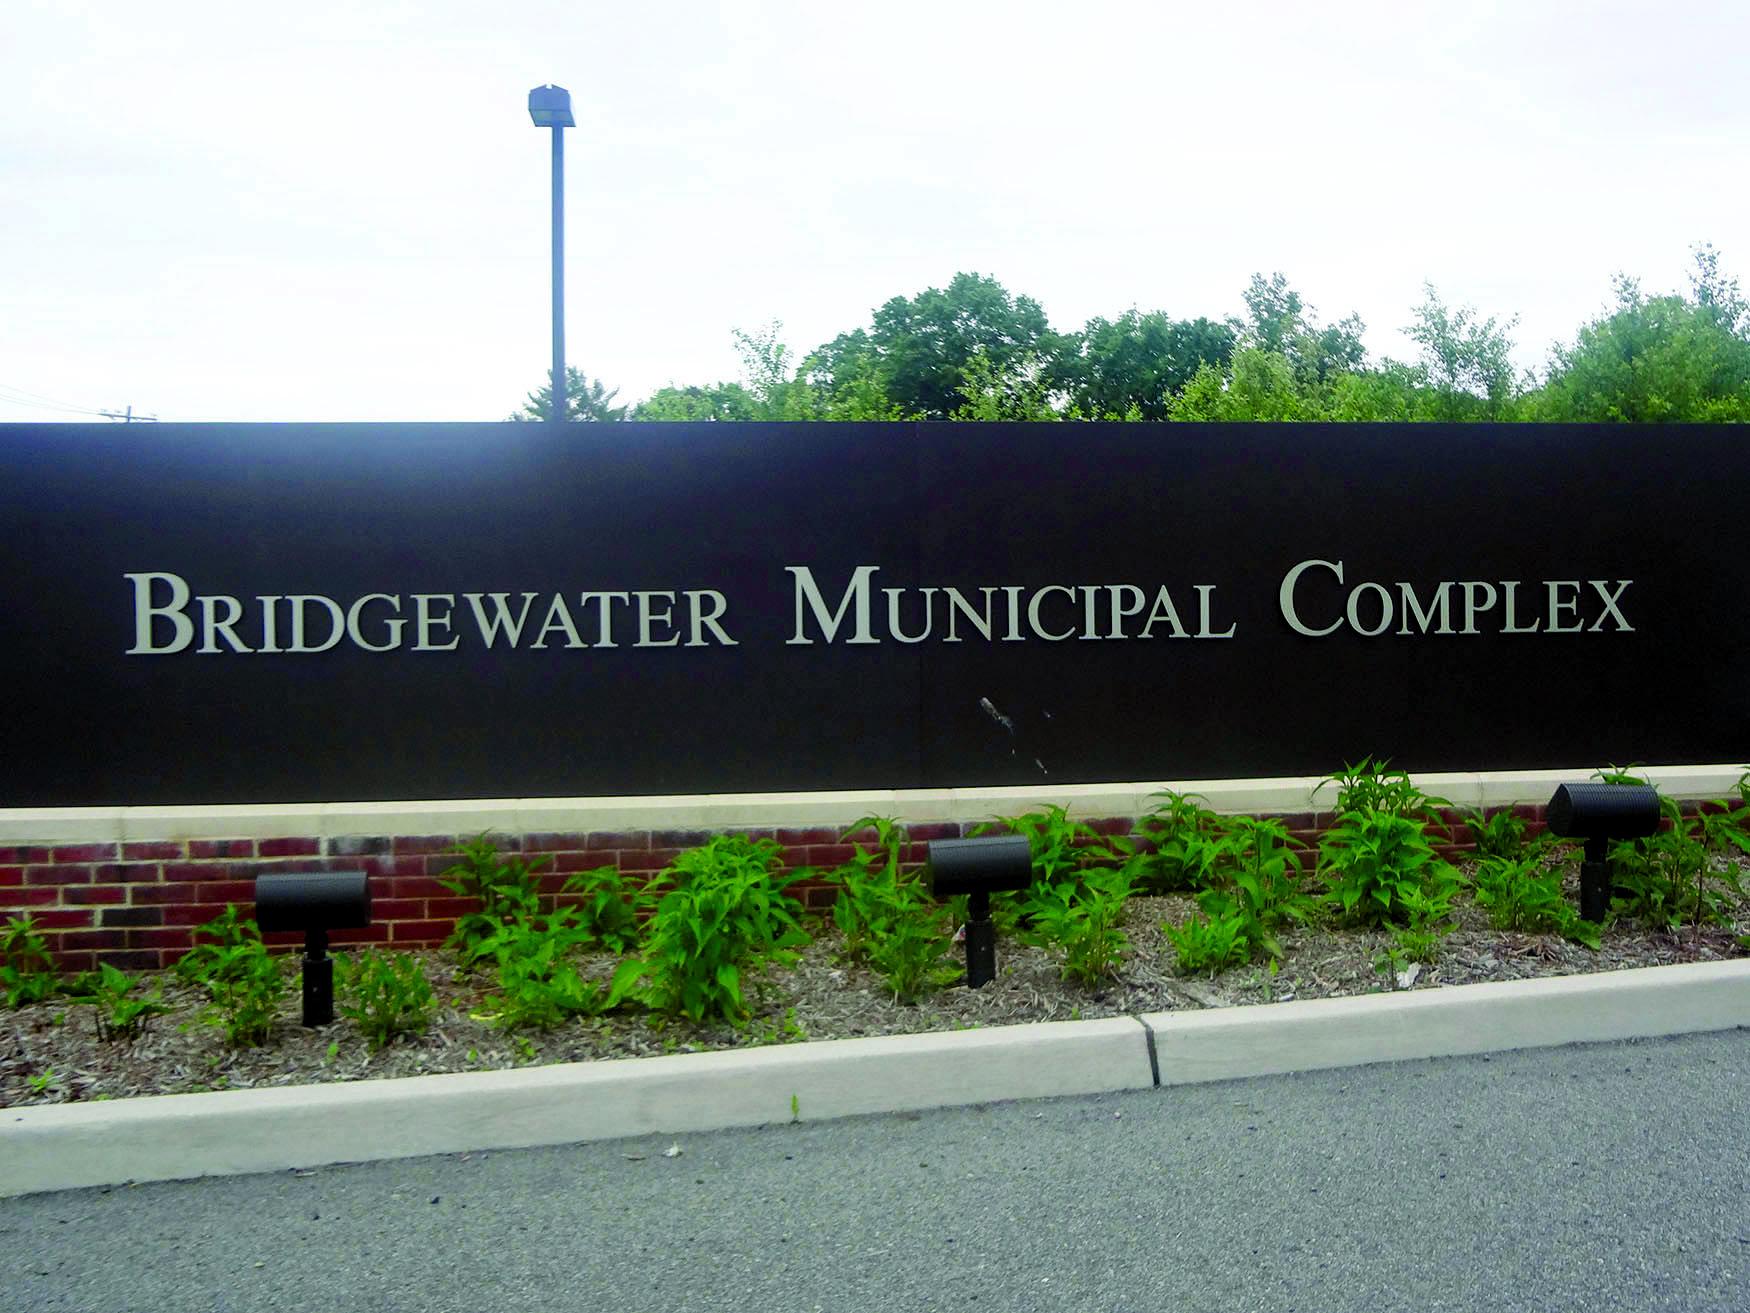 7d42dc4f8e31e5b3c12e_Bridgewater_municipal.jpg